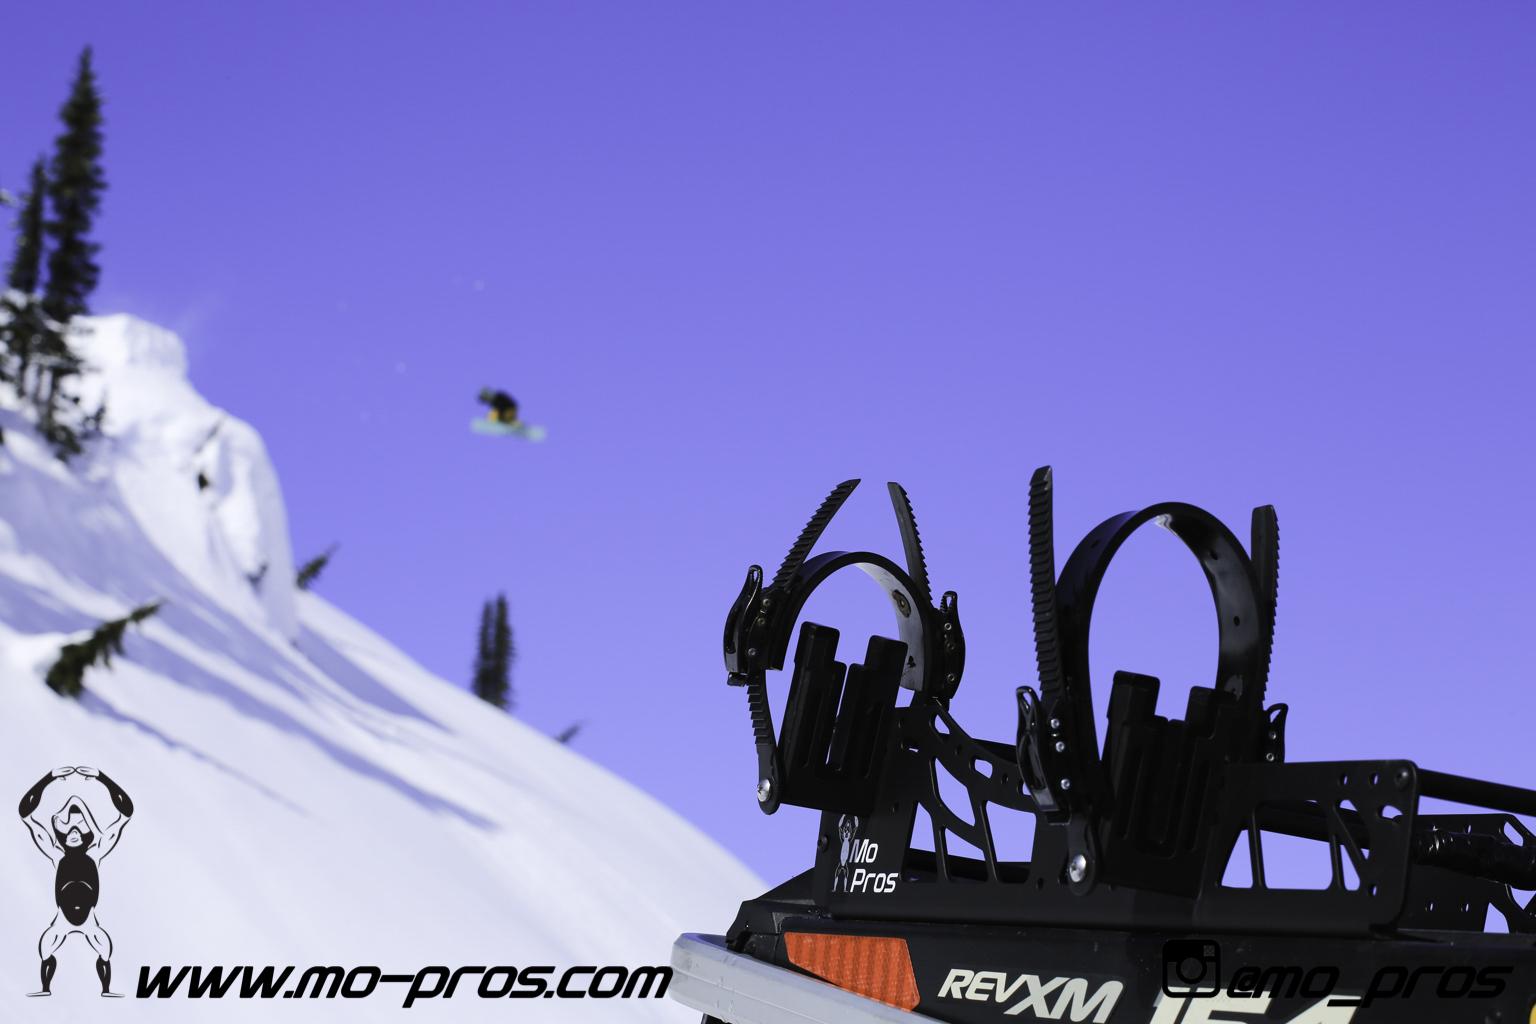 87_snowmobile bag_Snowmobile_timbersled bag_gas Rack_Gear_Gun Rack_LinQ Snowboard Ski_Ski_Snowbike_Timbersled Rack_Tsaina Rack_CFR rack_Cheetah Factory Racing_Snowboard rack_snowboard_Snowboarding_Ti.jpg